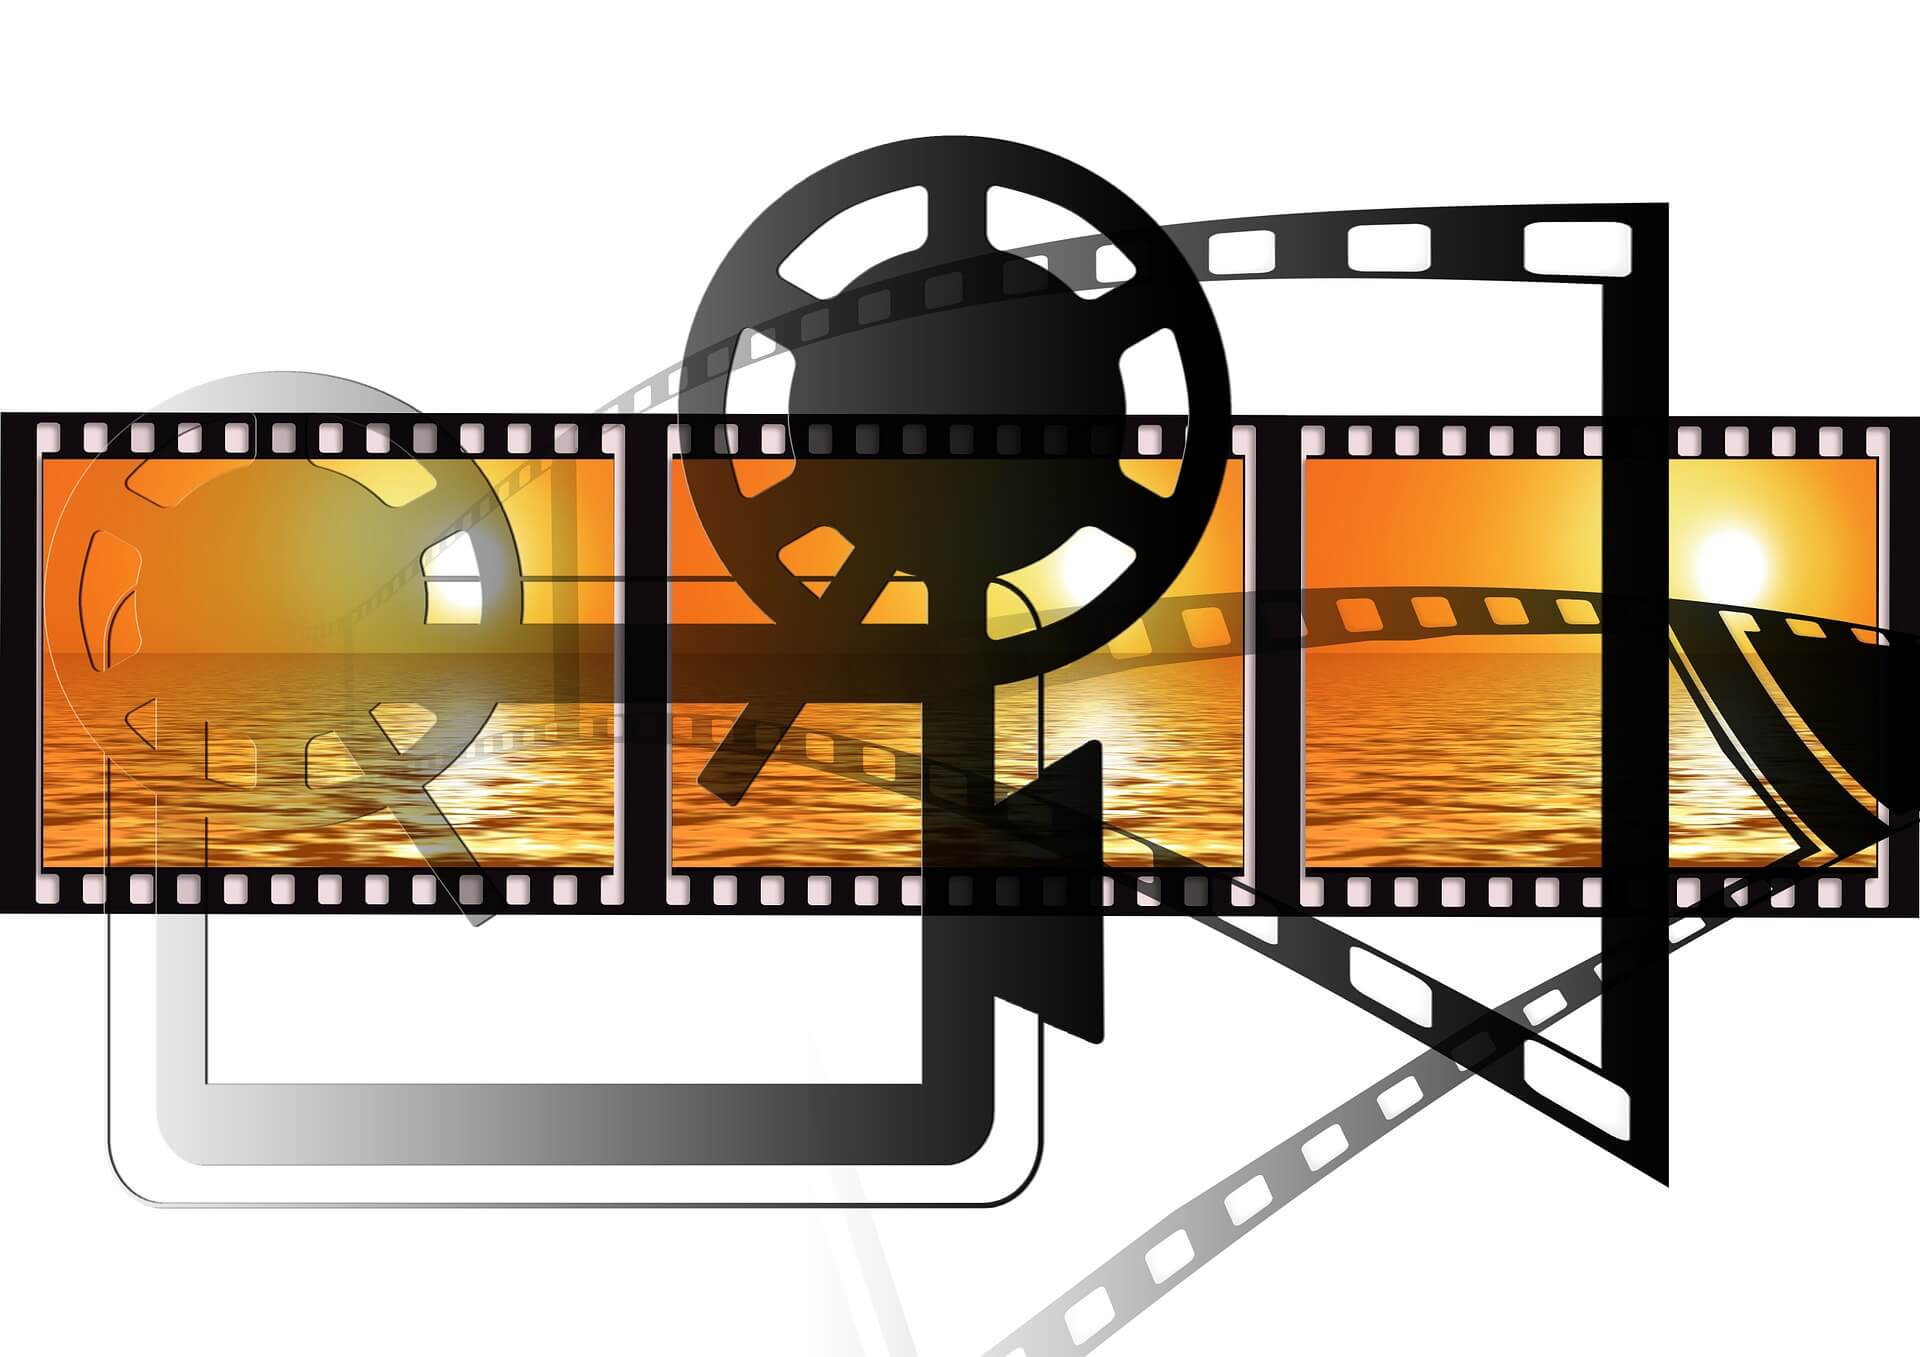 Videoanzeige